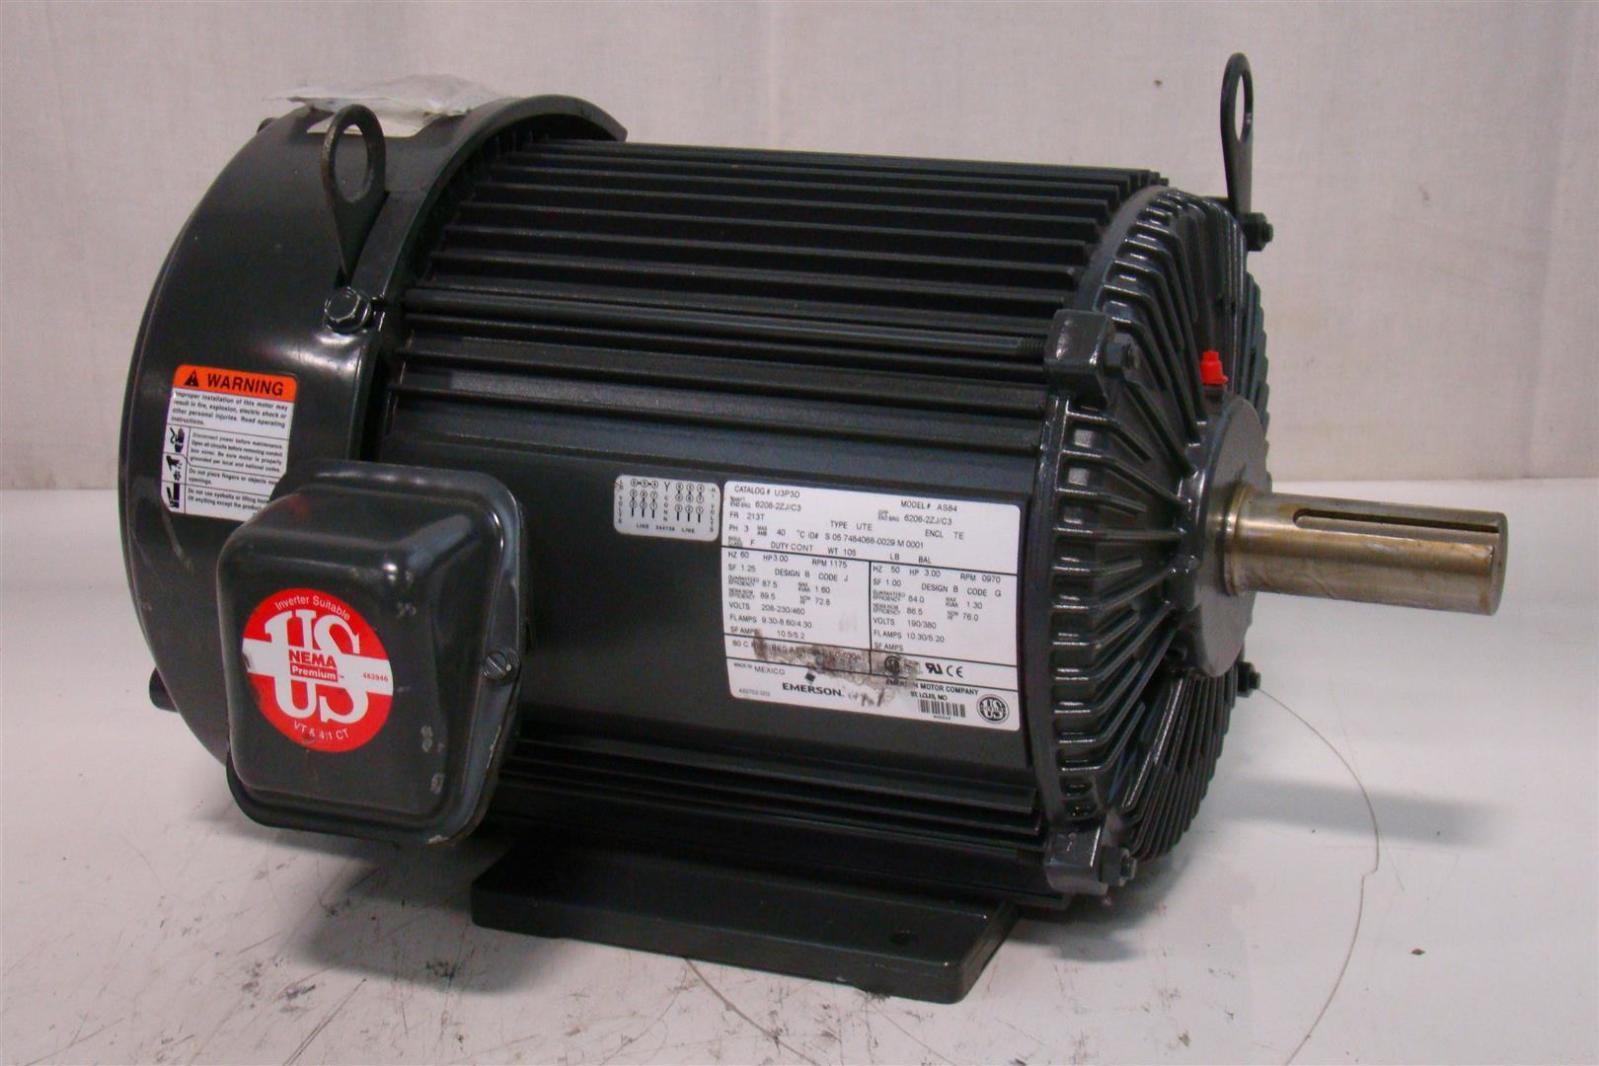 Emerson motor 230 460v 1175rpm 3hp ph3 u3p3d as84 joseph for Emerson electric motor parts